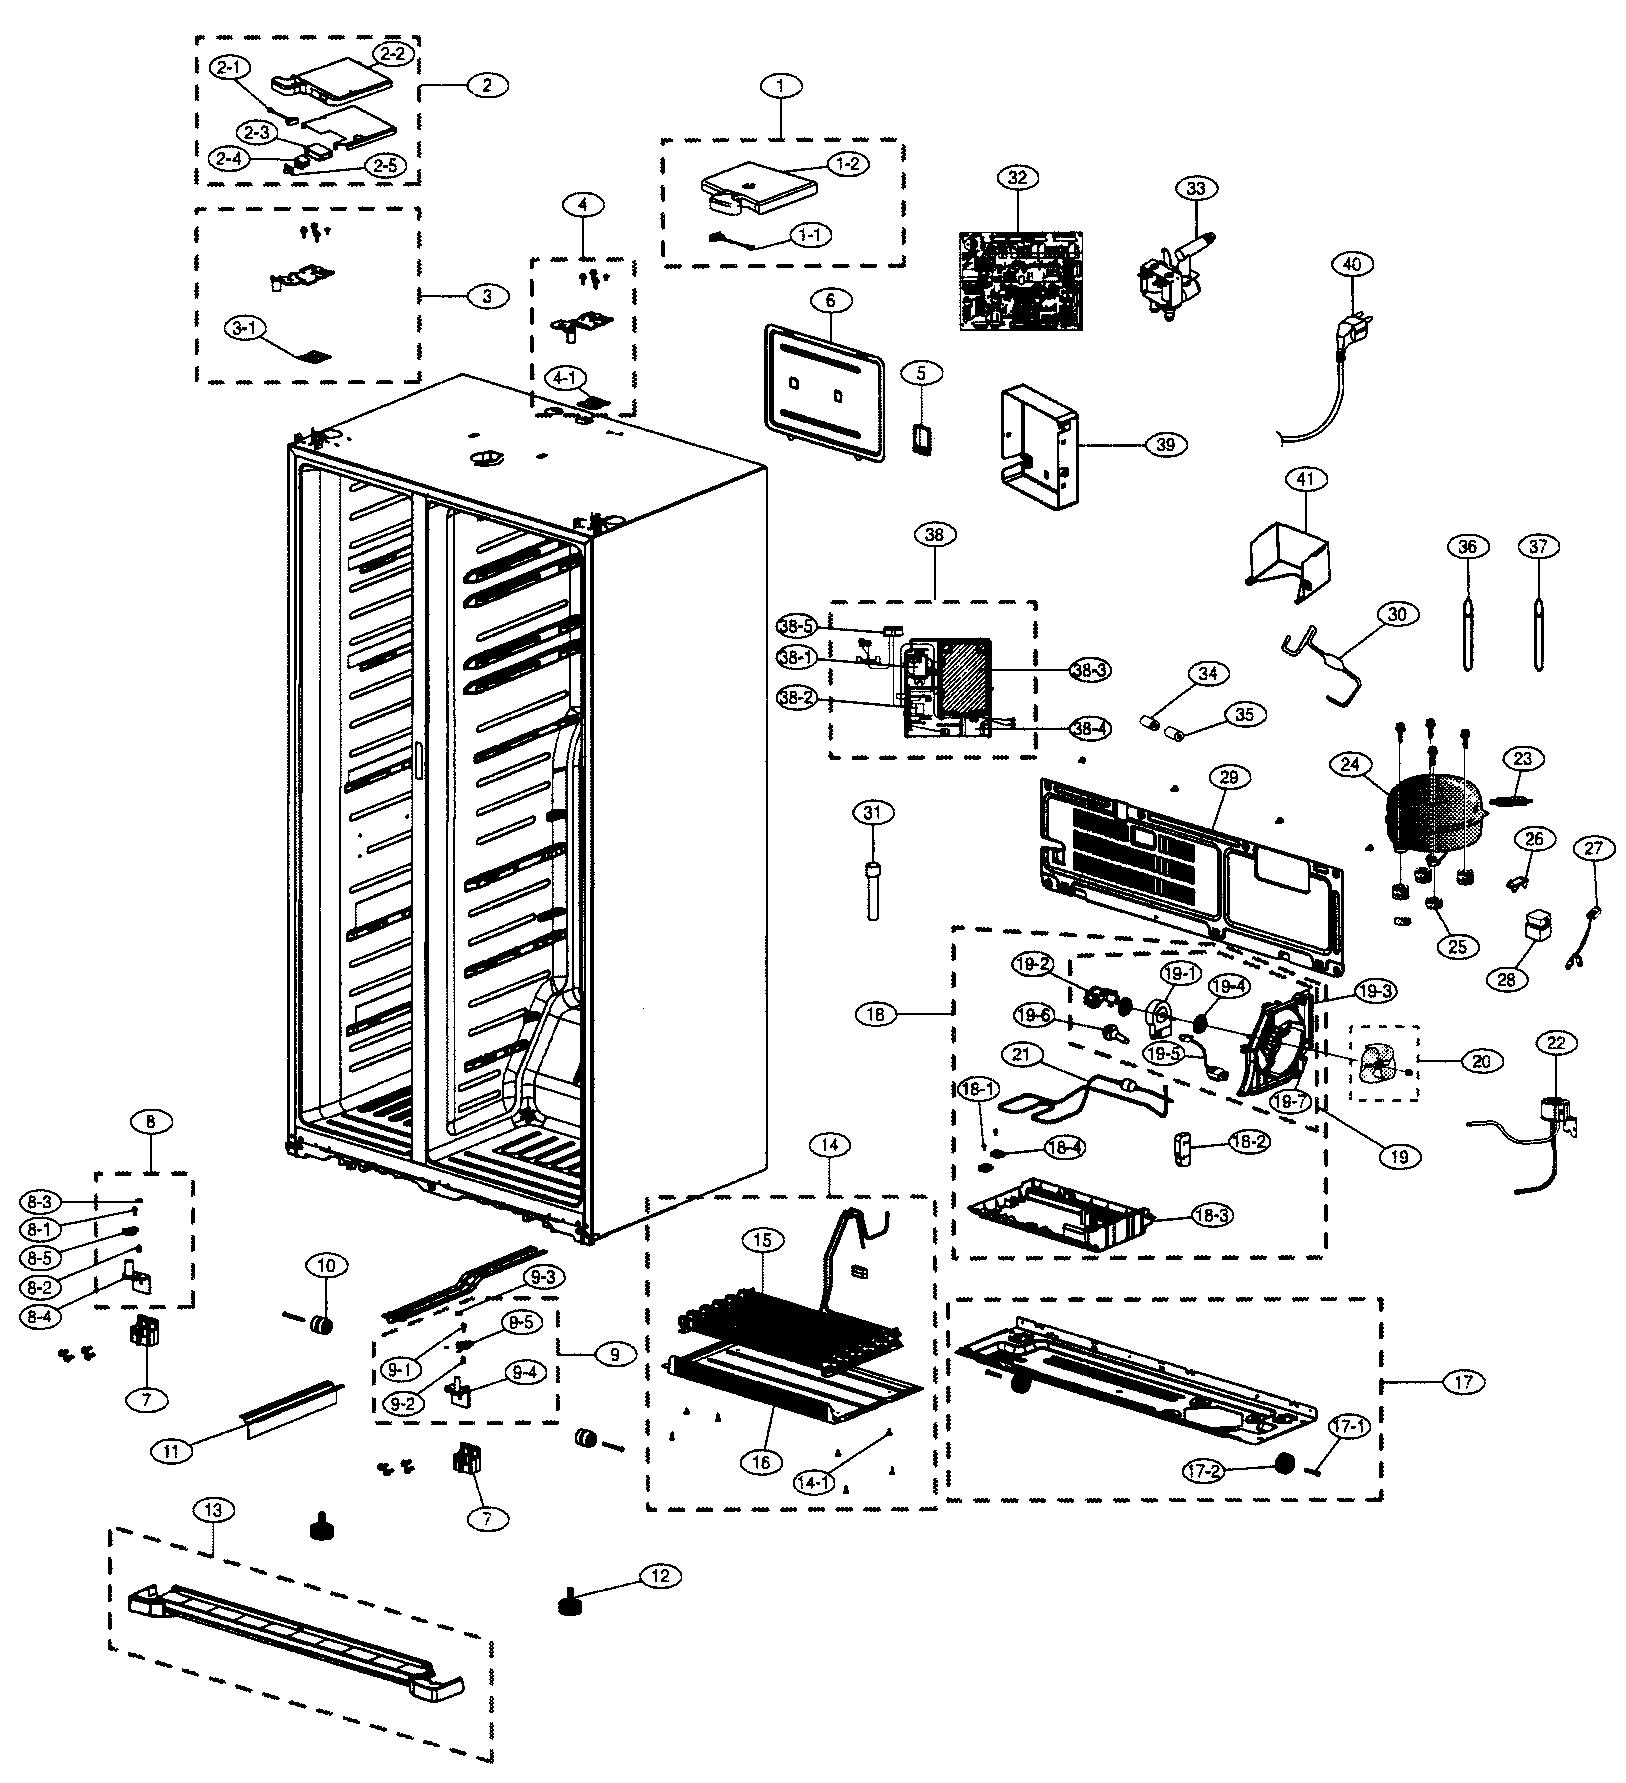 kenmore elite appliance parts diagrams wiring diagrams